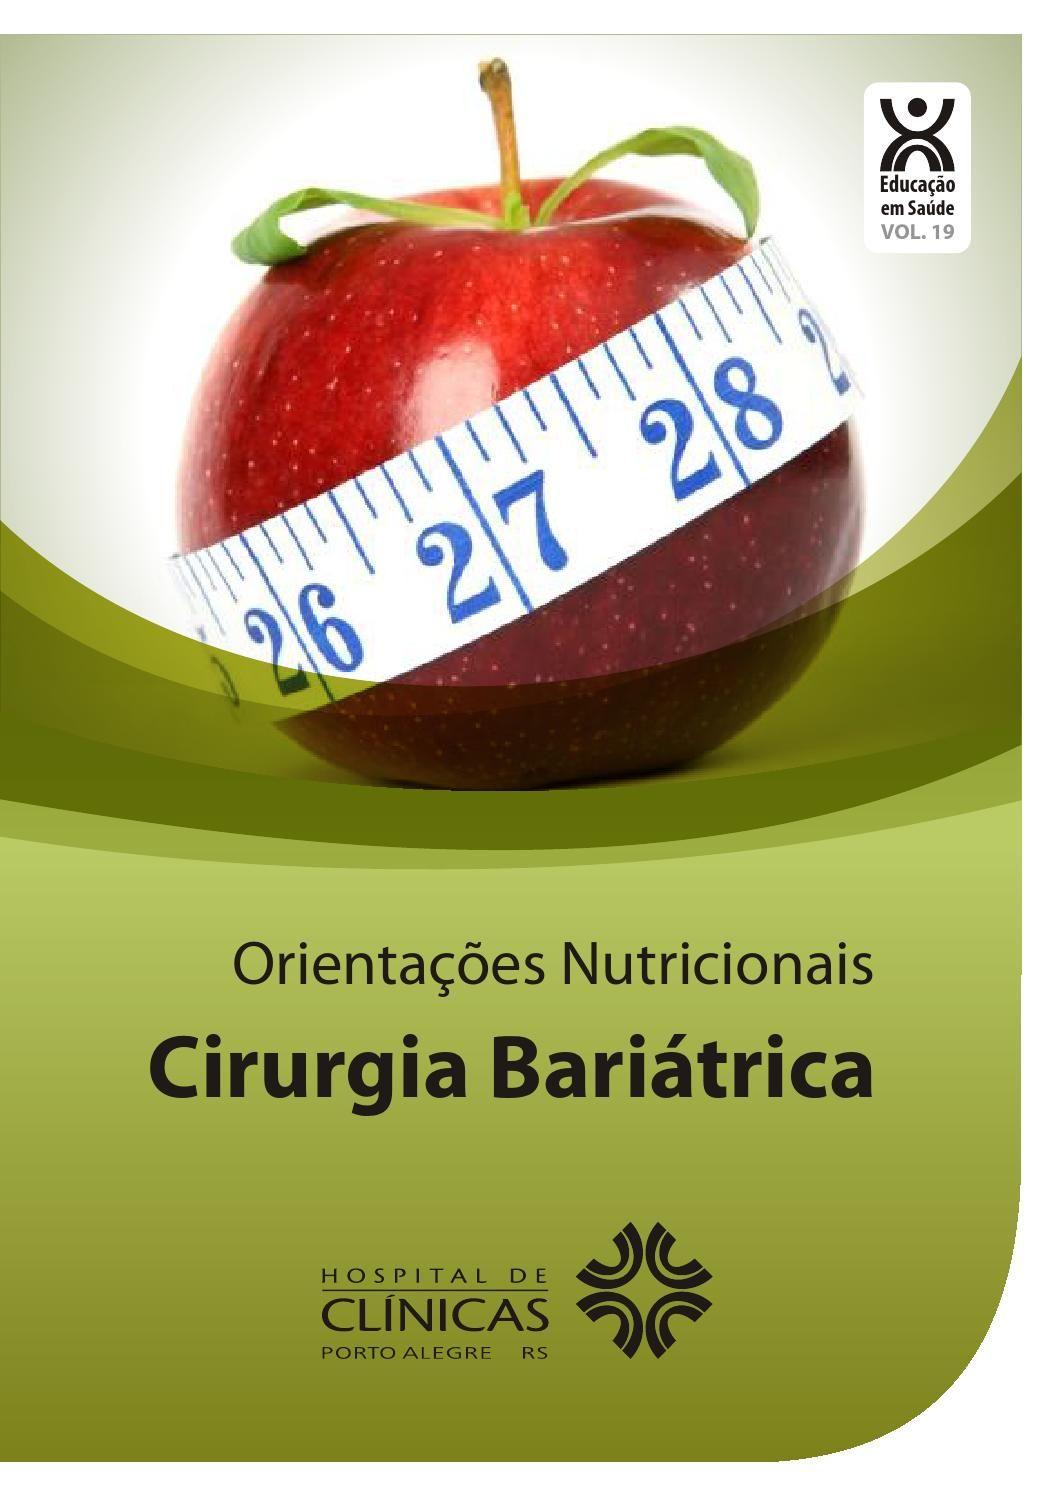 Volume 19 cirurgia bariatrica Make it simple, Food